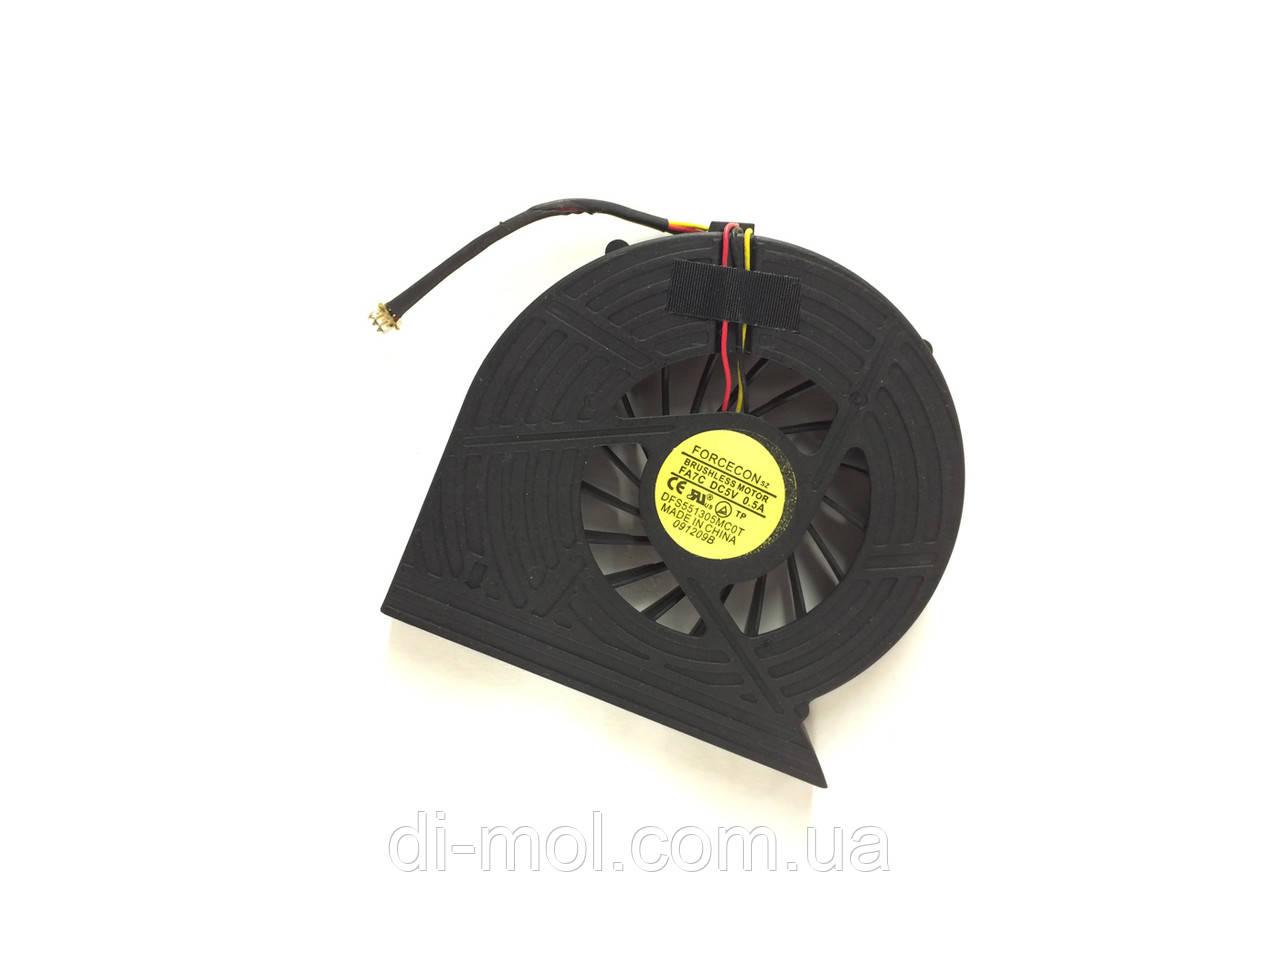 Вентилятор для ноутбука Acer Aspire 8730, Aspire 8730G series, 3-pin